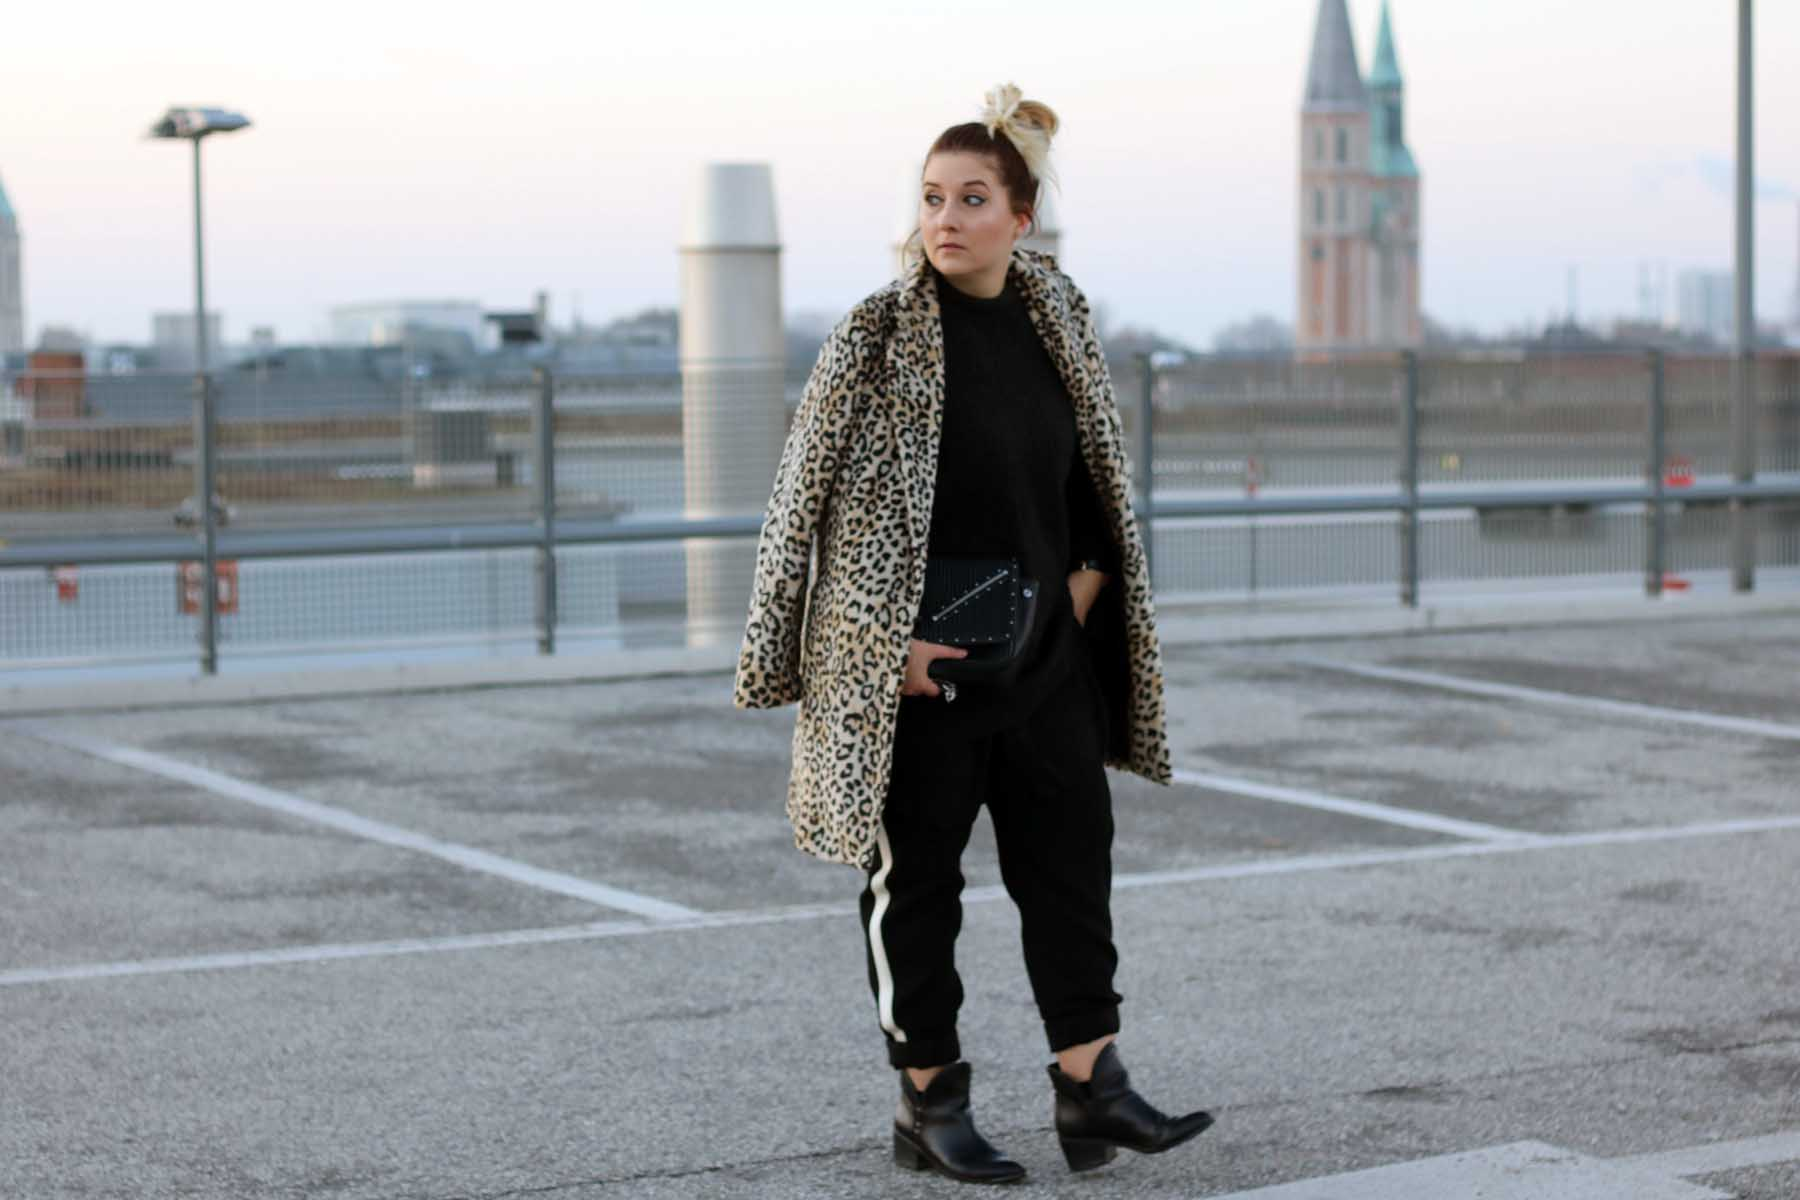 outift-leomantel-mantel-winter-leoparden-modeblog-fashionblog-look-braunschweig27